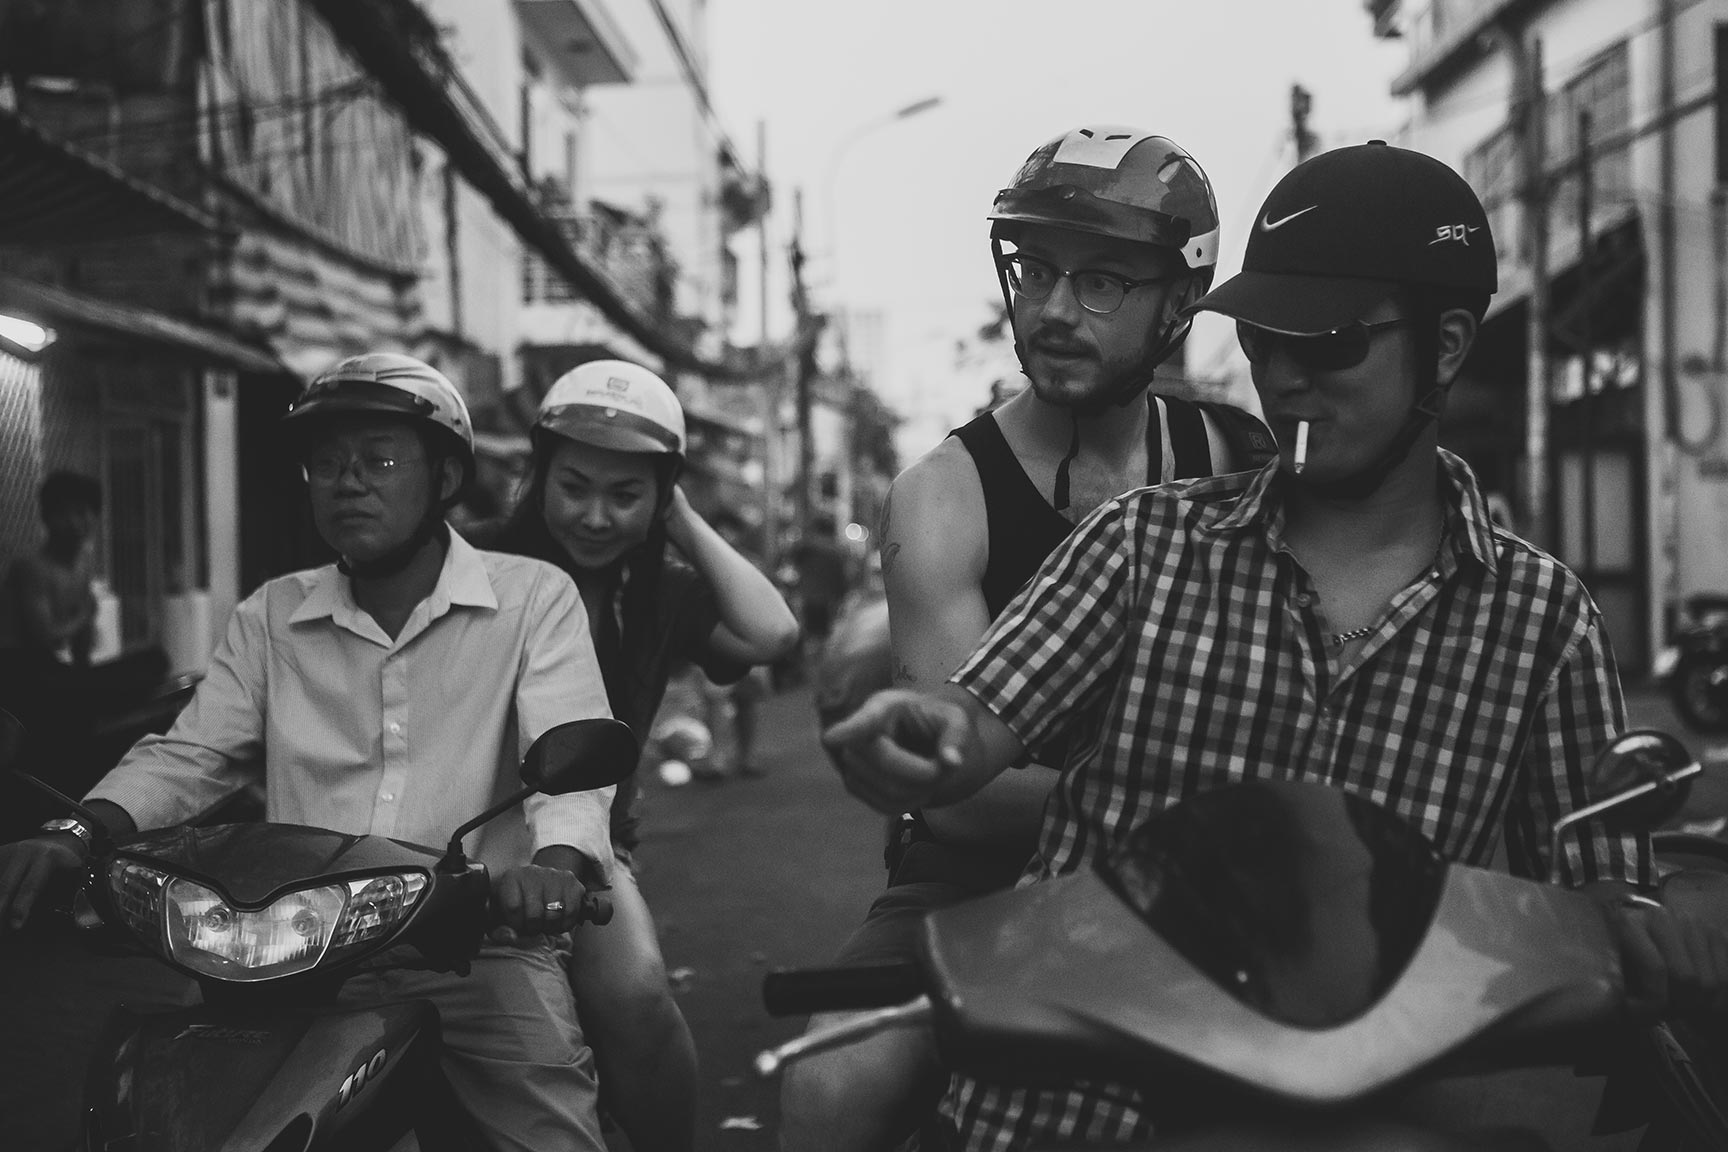 madeinvietnamfilm_charlieaaron.jpg